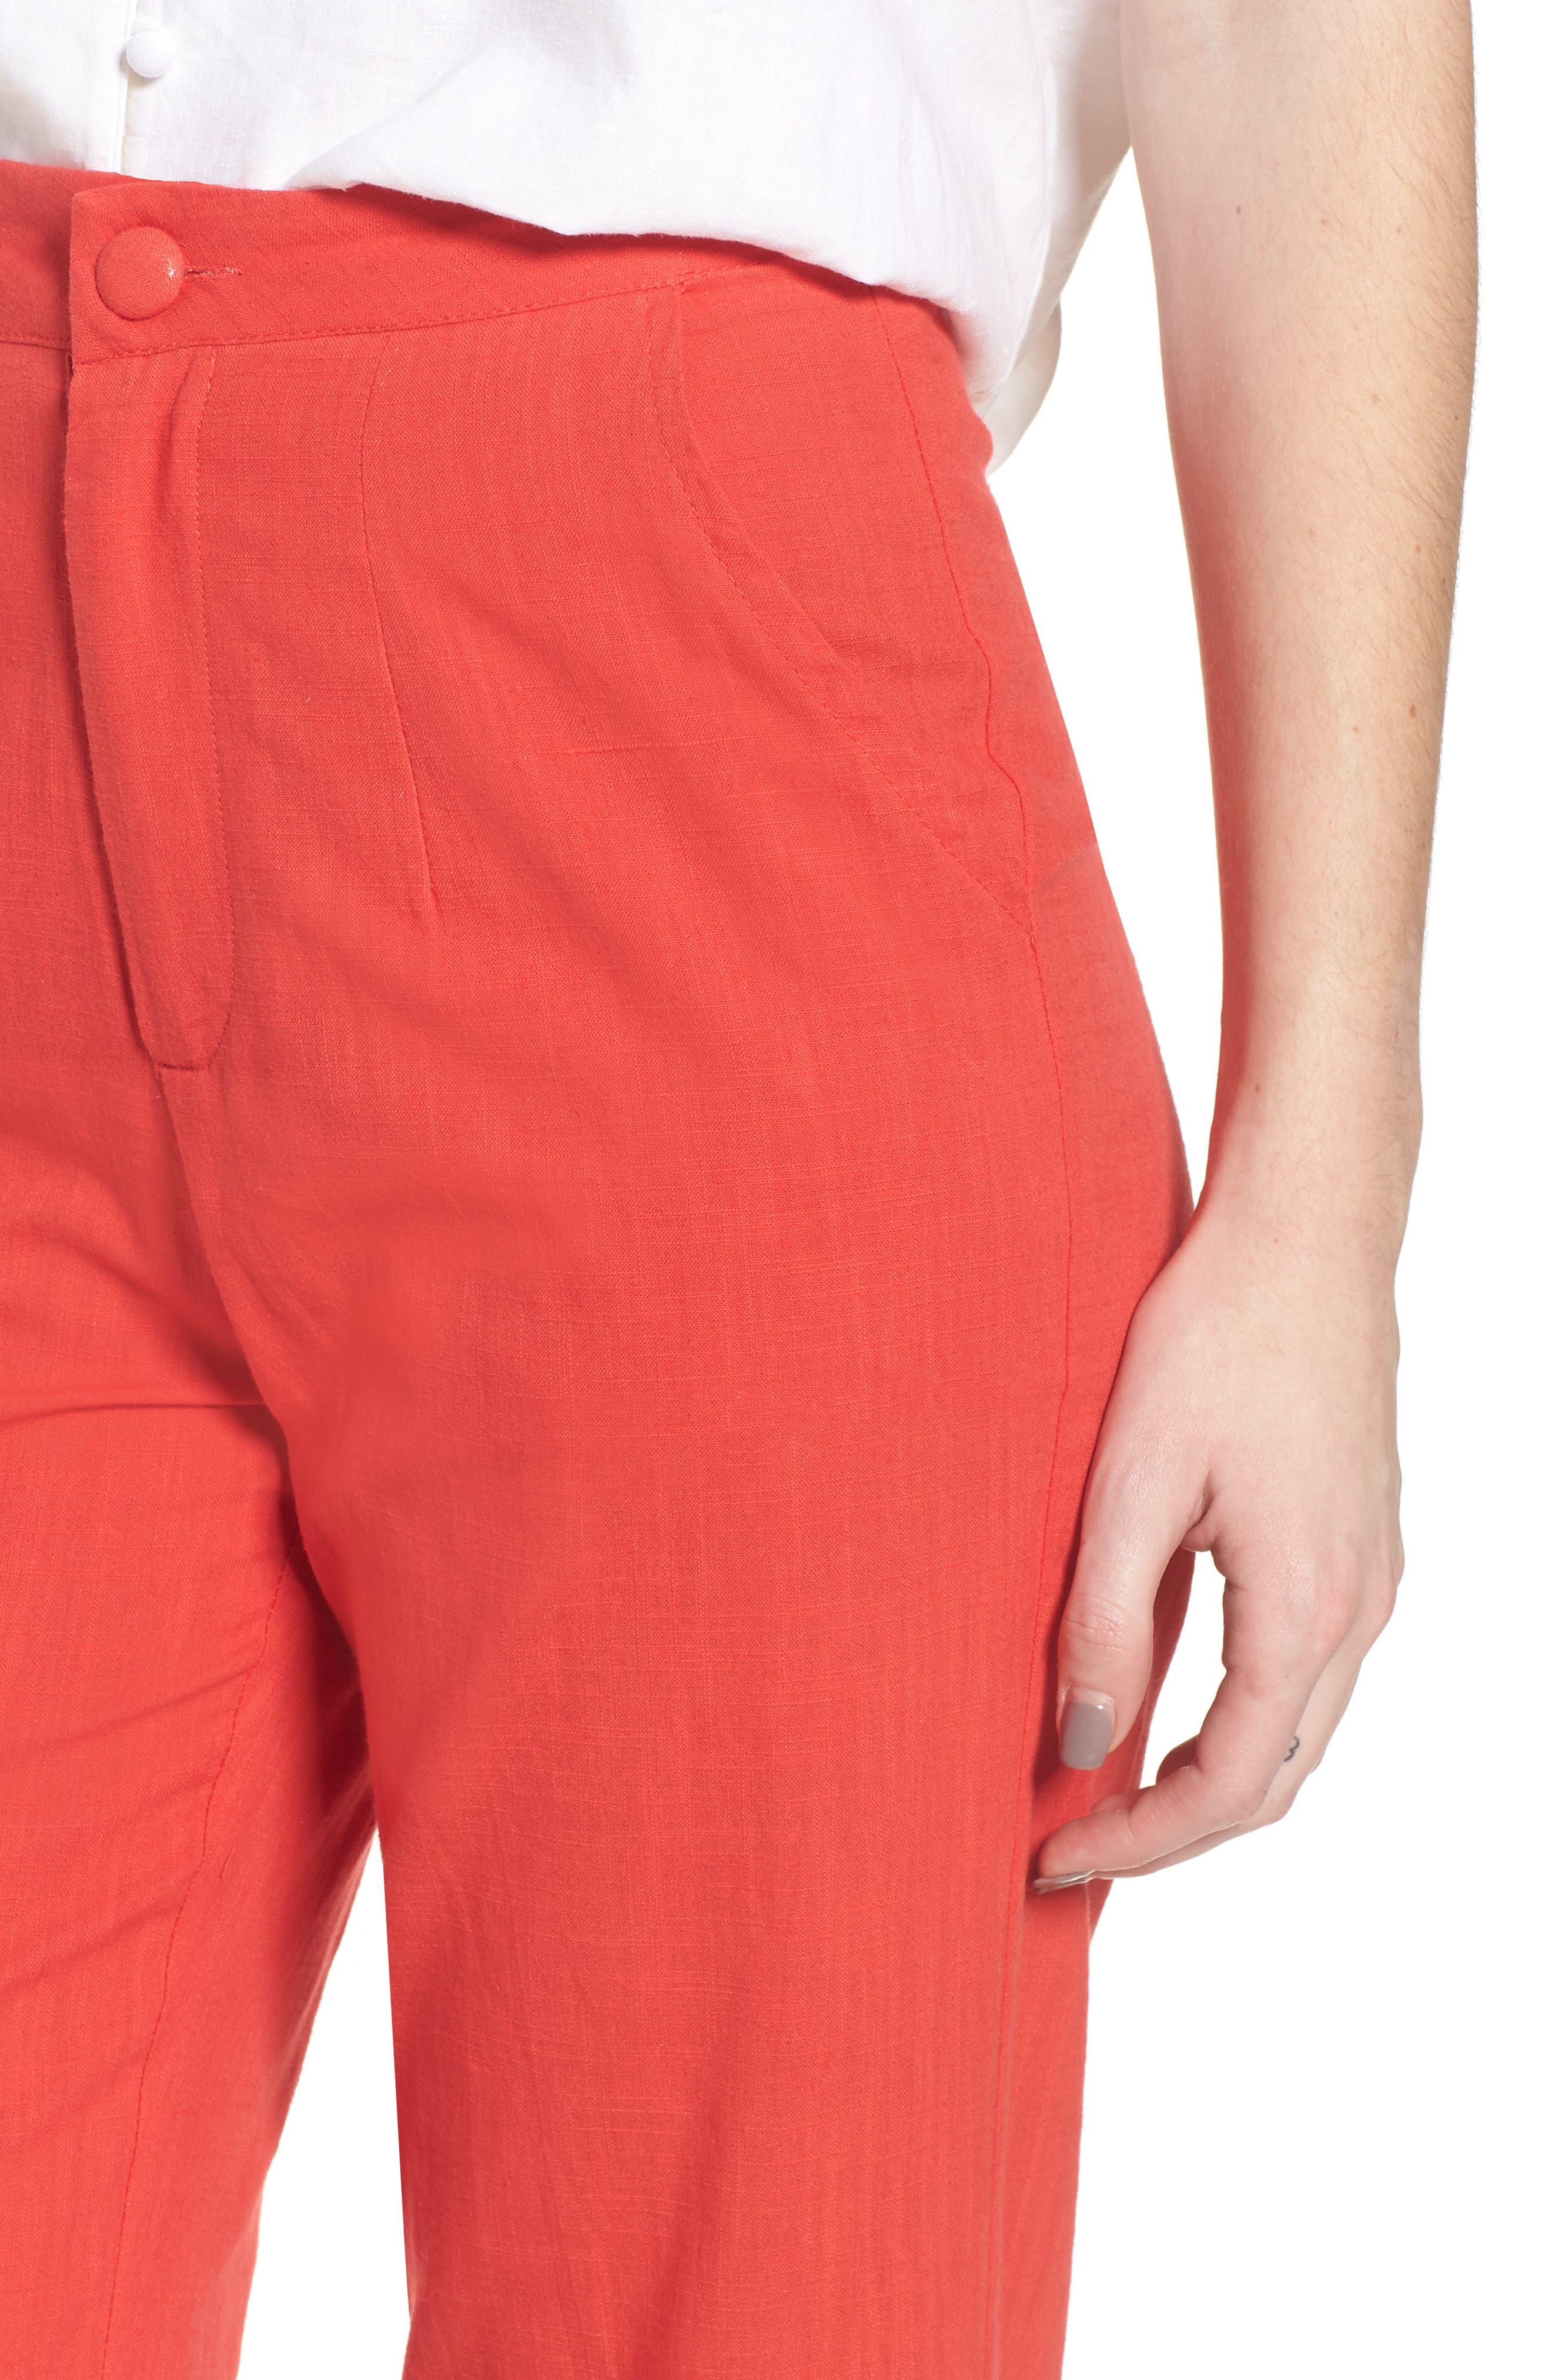 Femme Fatale High Waist Pants,                             Alternate thumbnail 4, color,                             Red